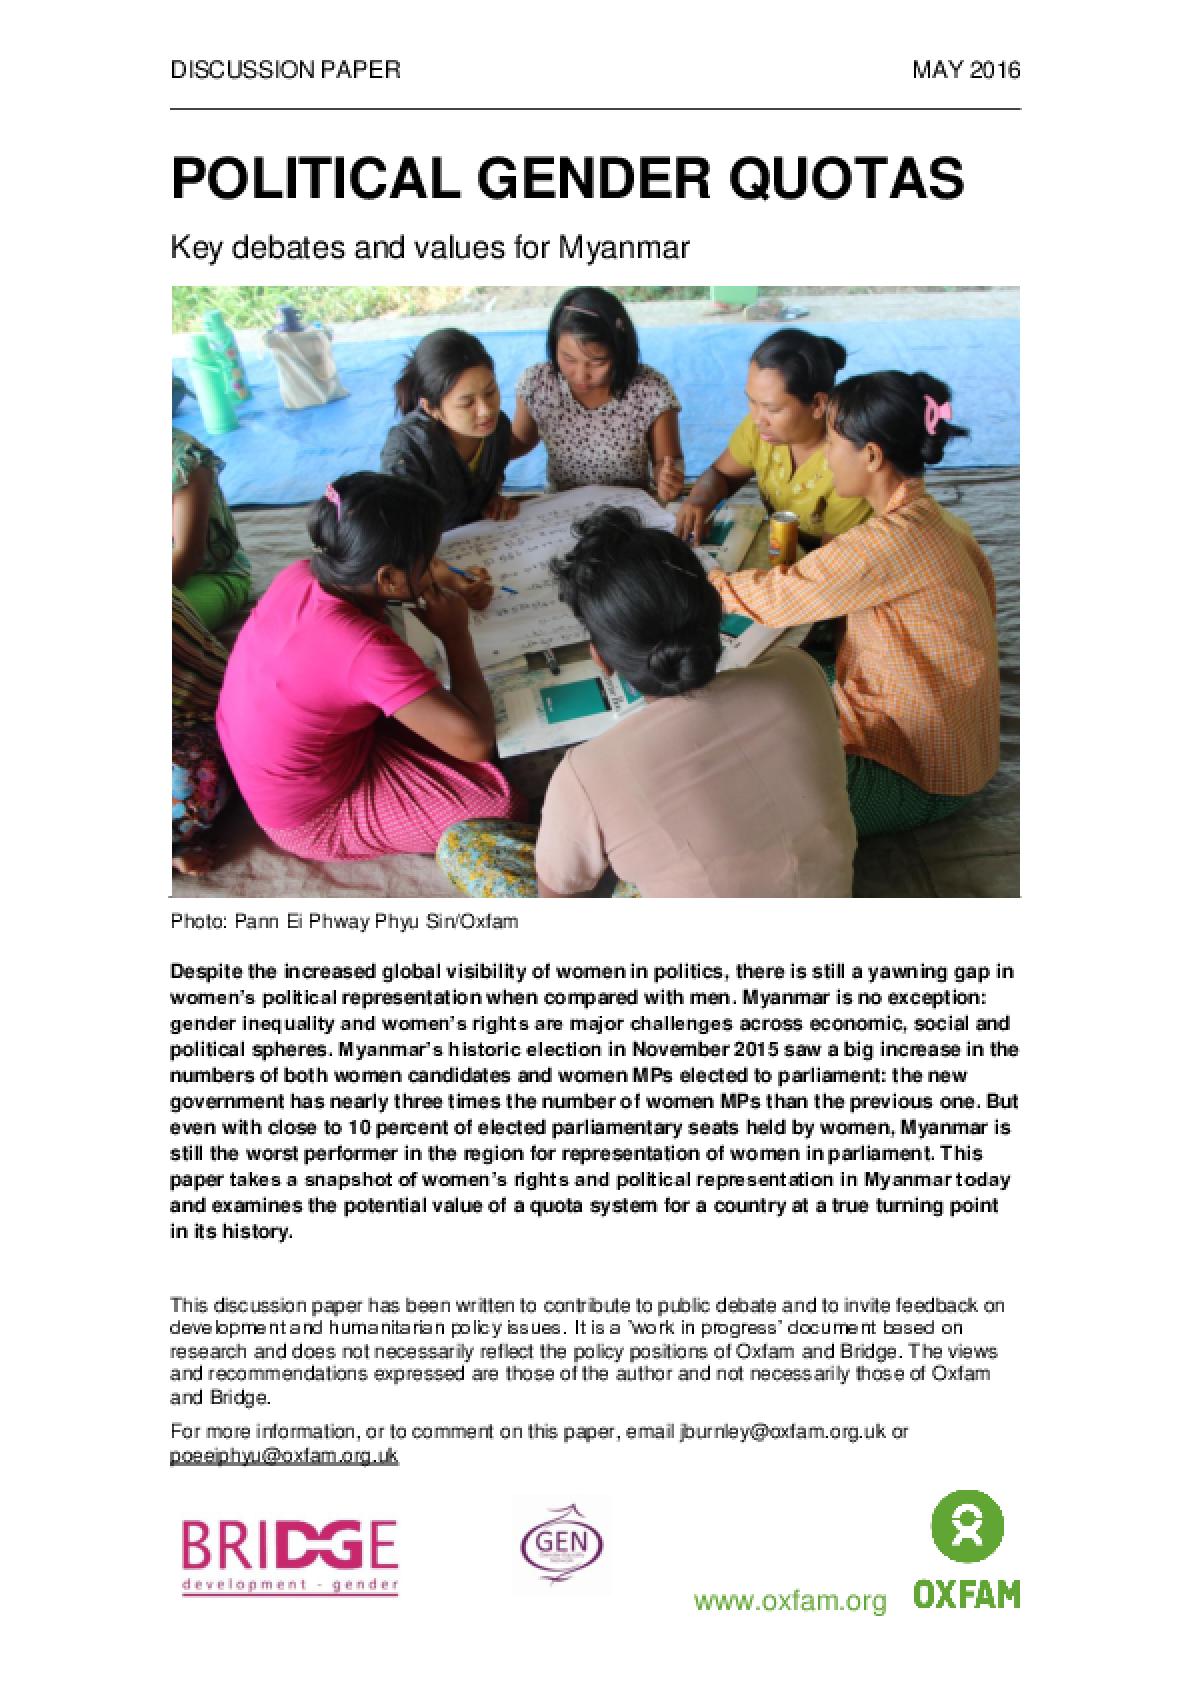 Political Gender Quotas: Key debates and values for Myanmar